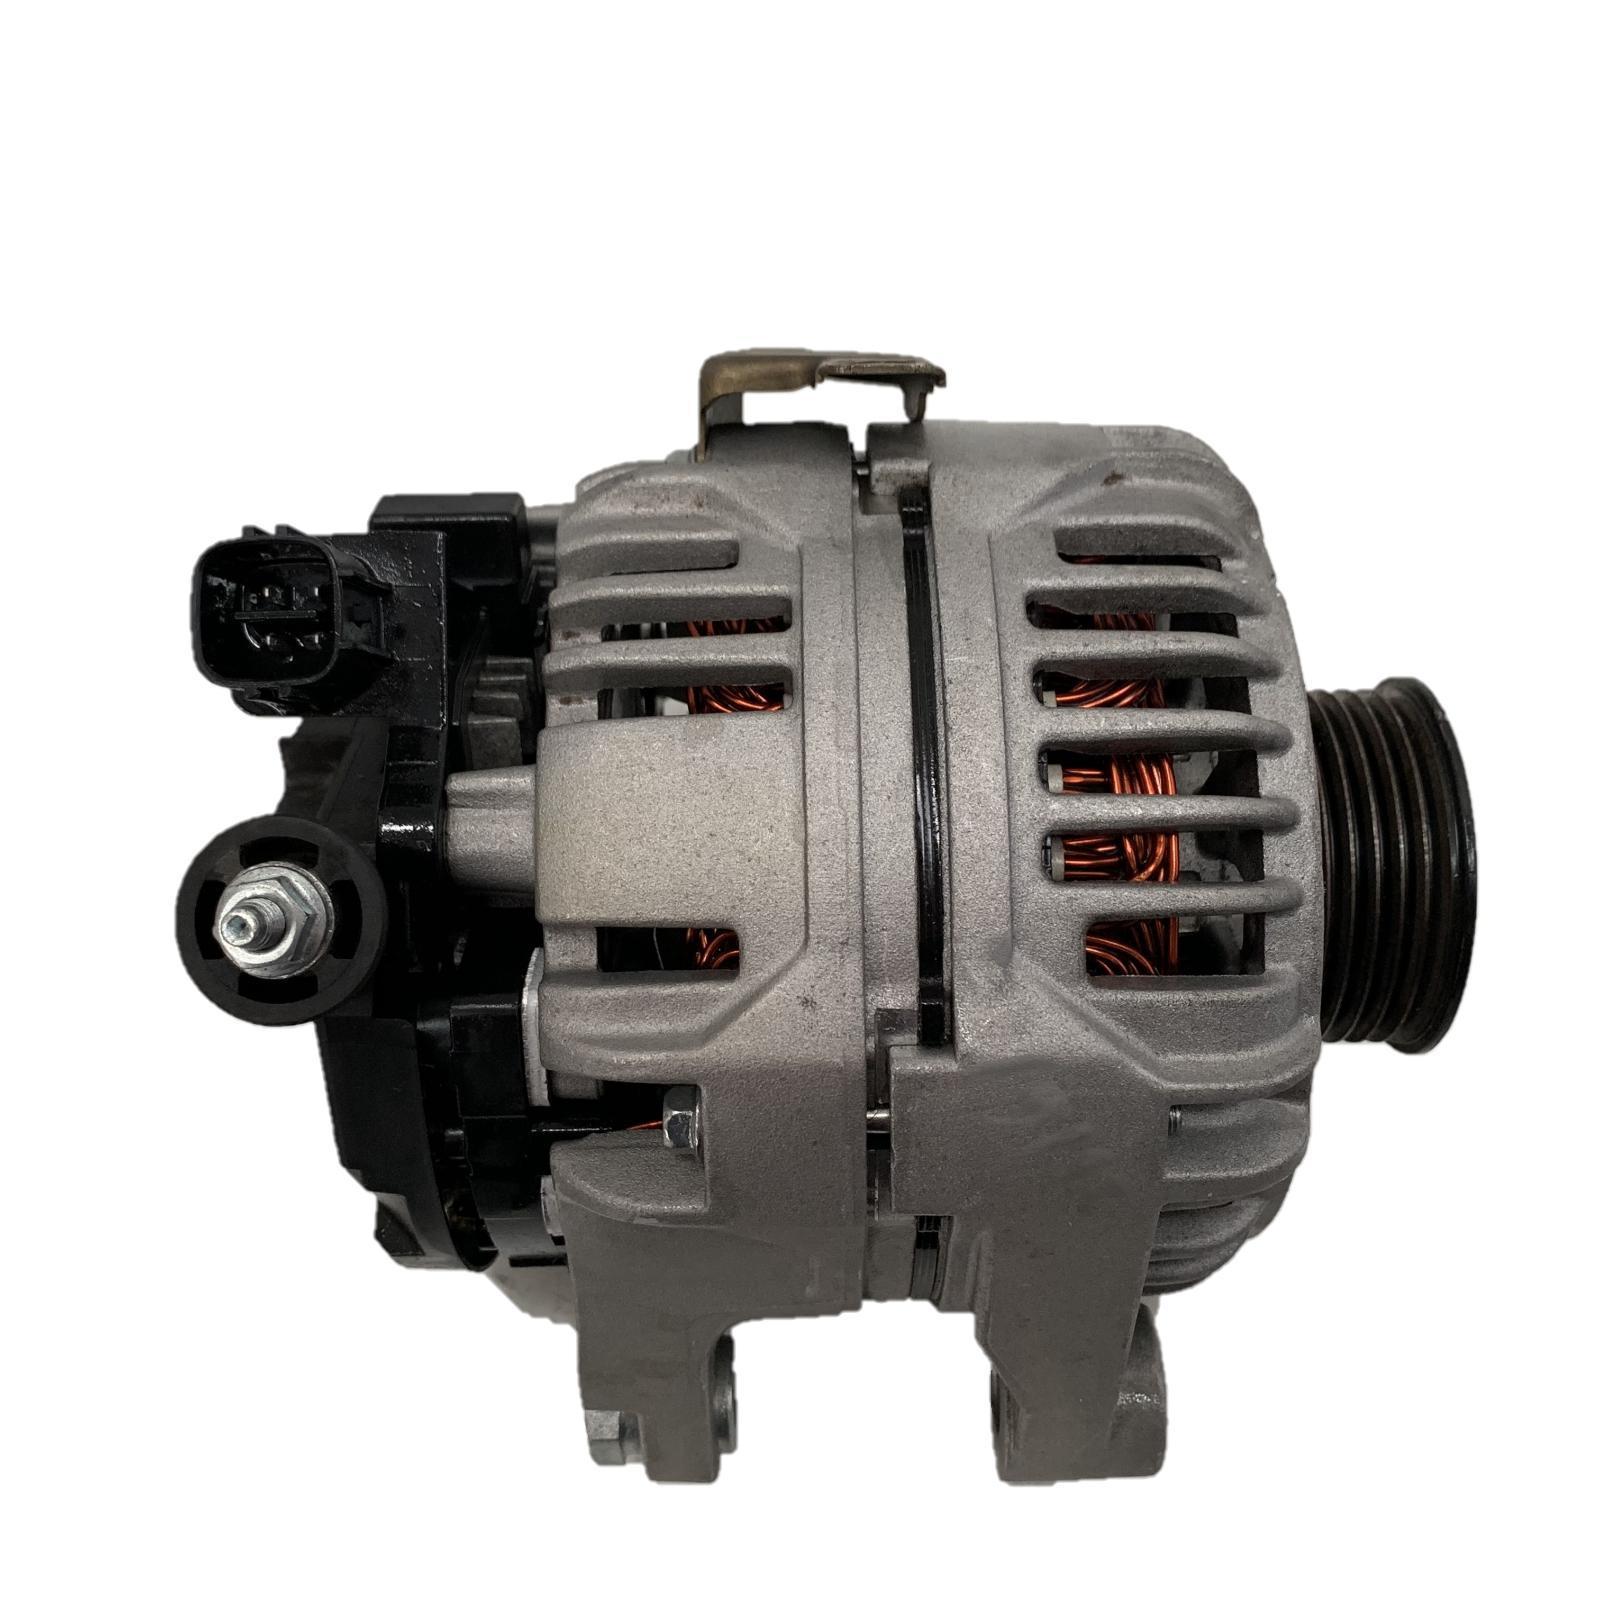 TOYOTA AVALON, Alternator, 3.0, 1MZ-FE, BOSCH P/N 27060-YF010, MCX10R, 07/00-06/05